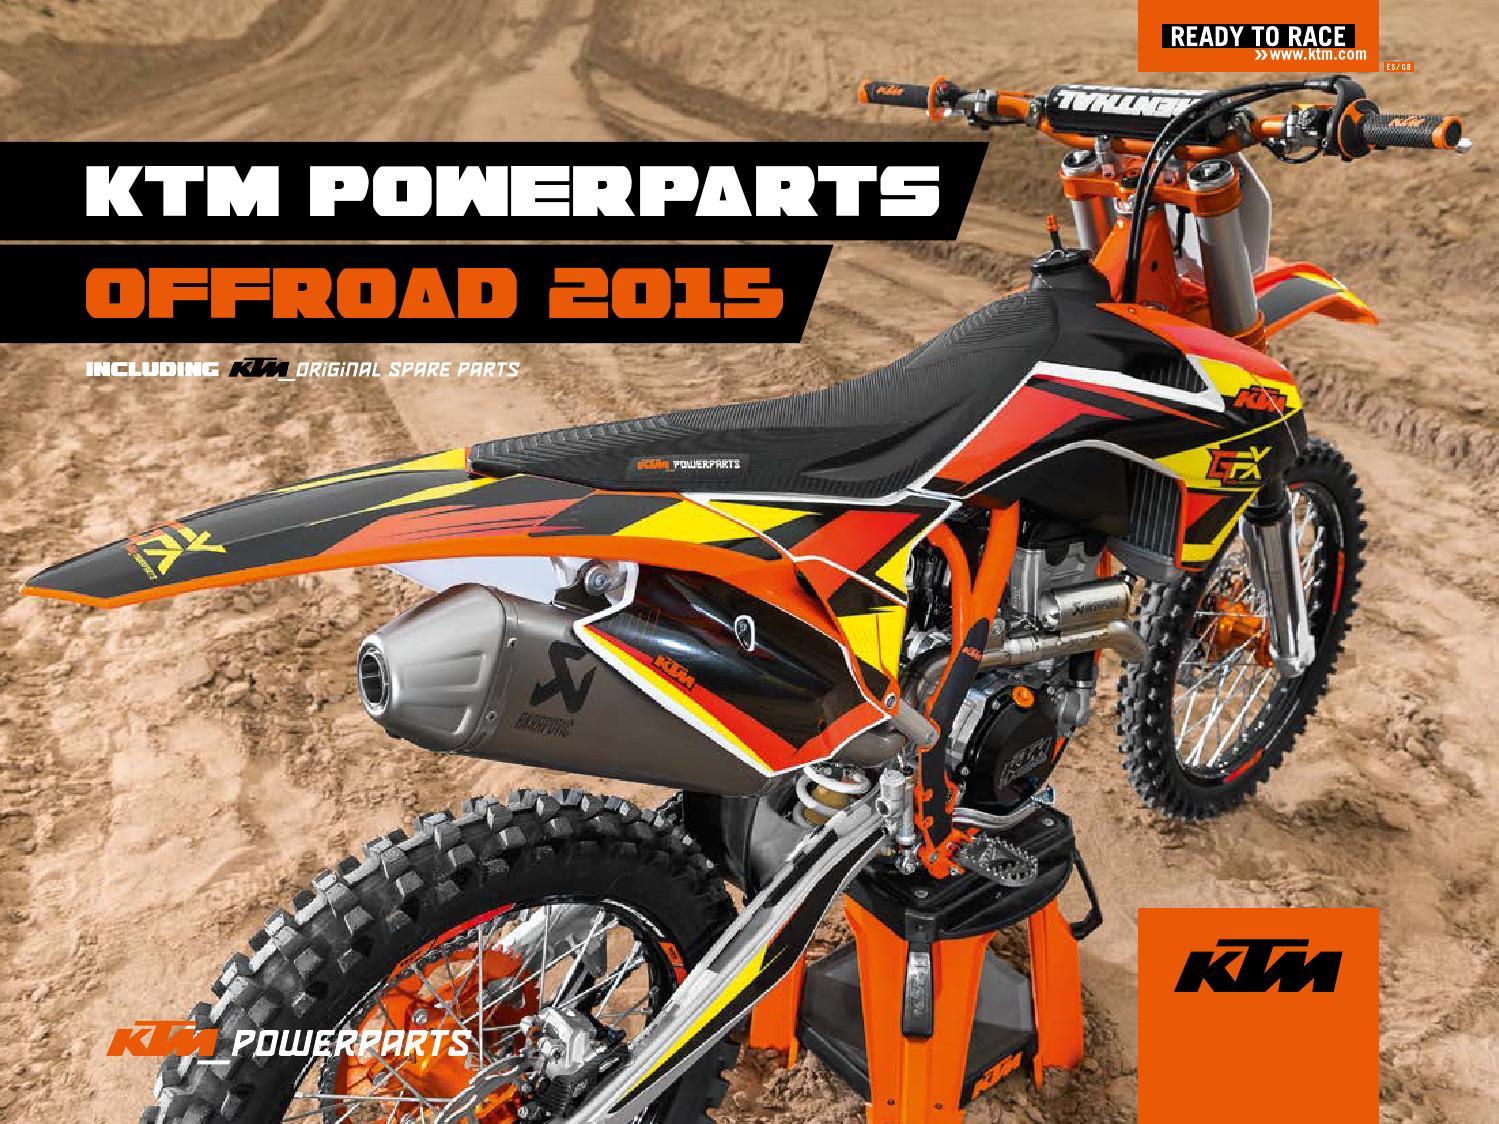 1 Par Dise/ño universal Moto Manguitos Manillar Guardamanos Moto Motocross Dirt Pit Moto Off Road